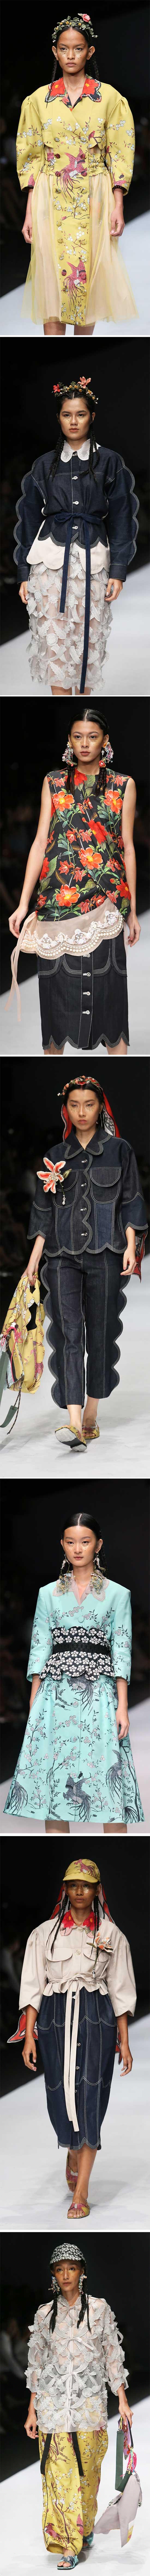 Indonesia Fashion Forward presents I.K.YK, Peggy Hartanto, Toton